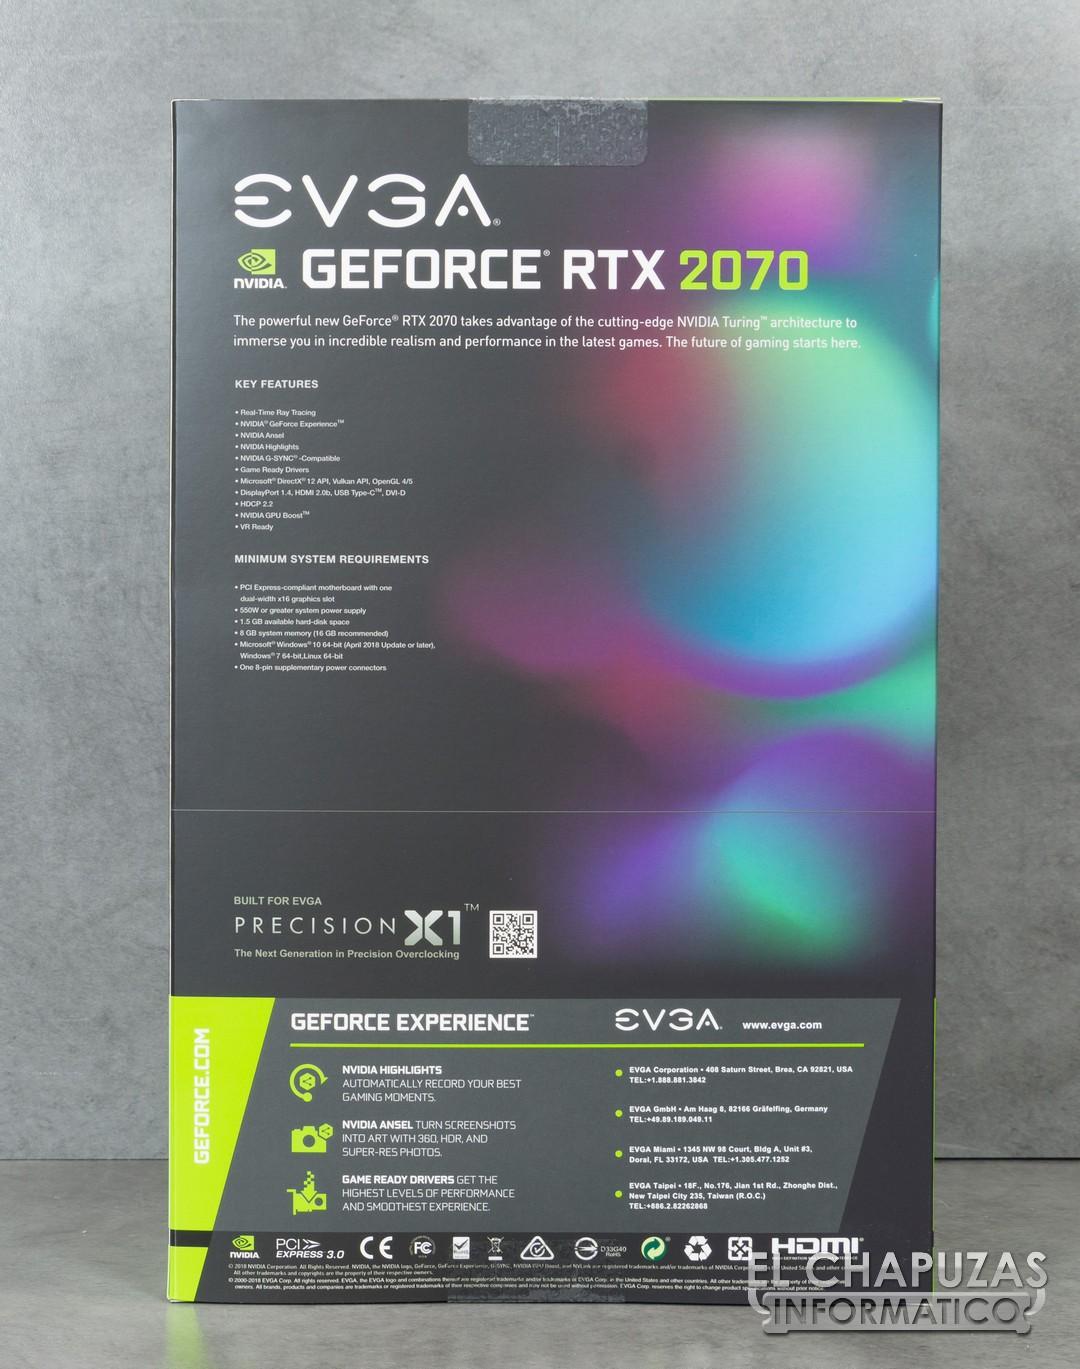 Review: EVGA GeForce RTX 2070 Black